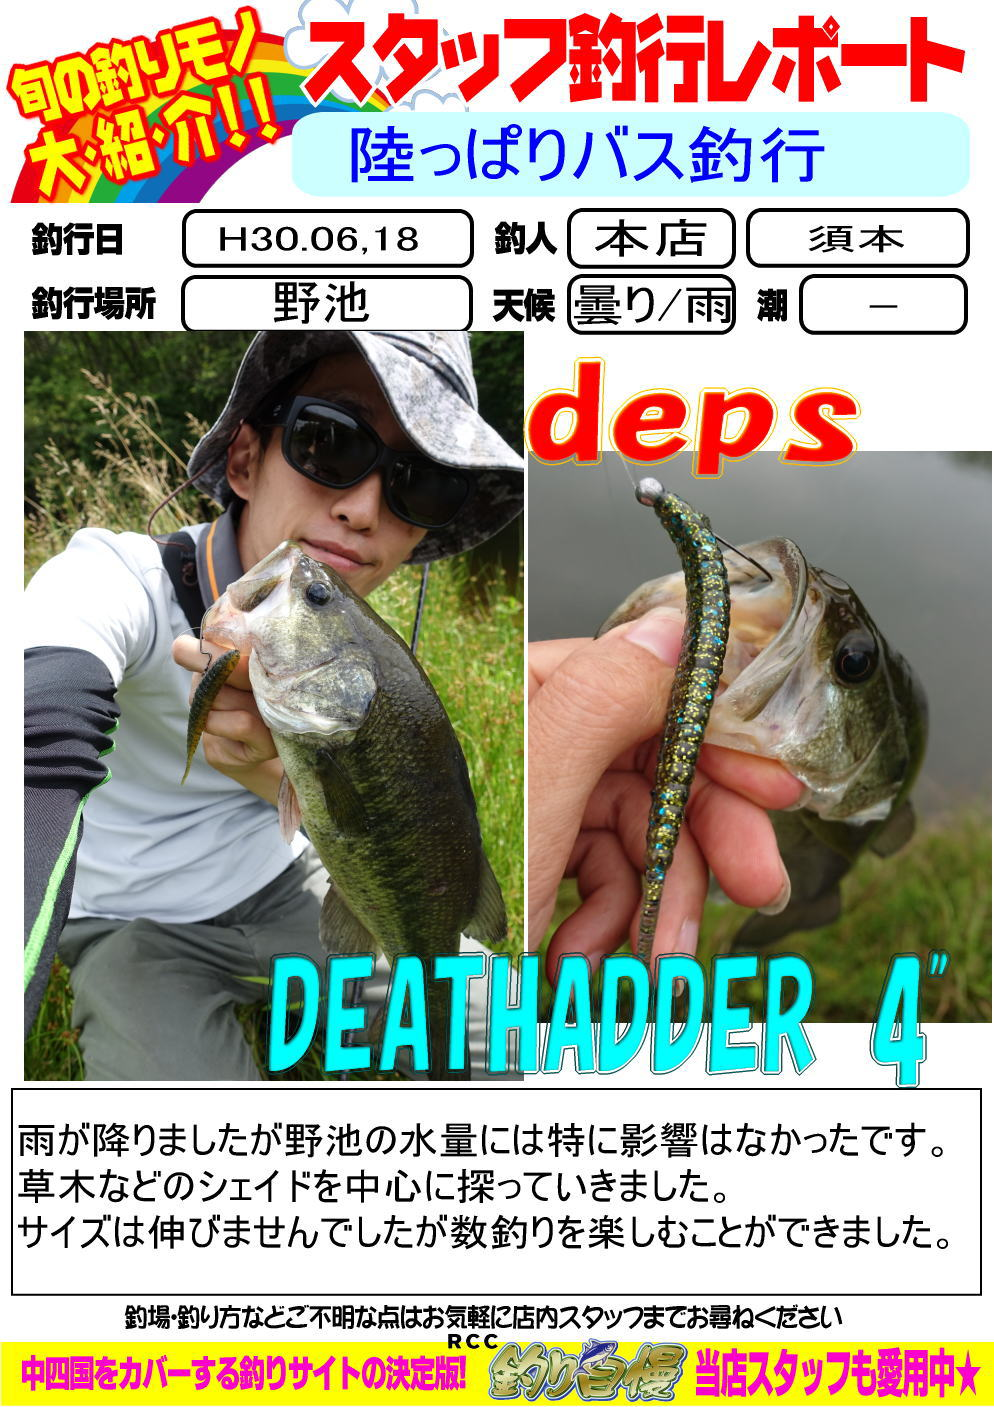 http://www.e-angle.co.jp/shop/blog/H30.06.21.jpg